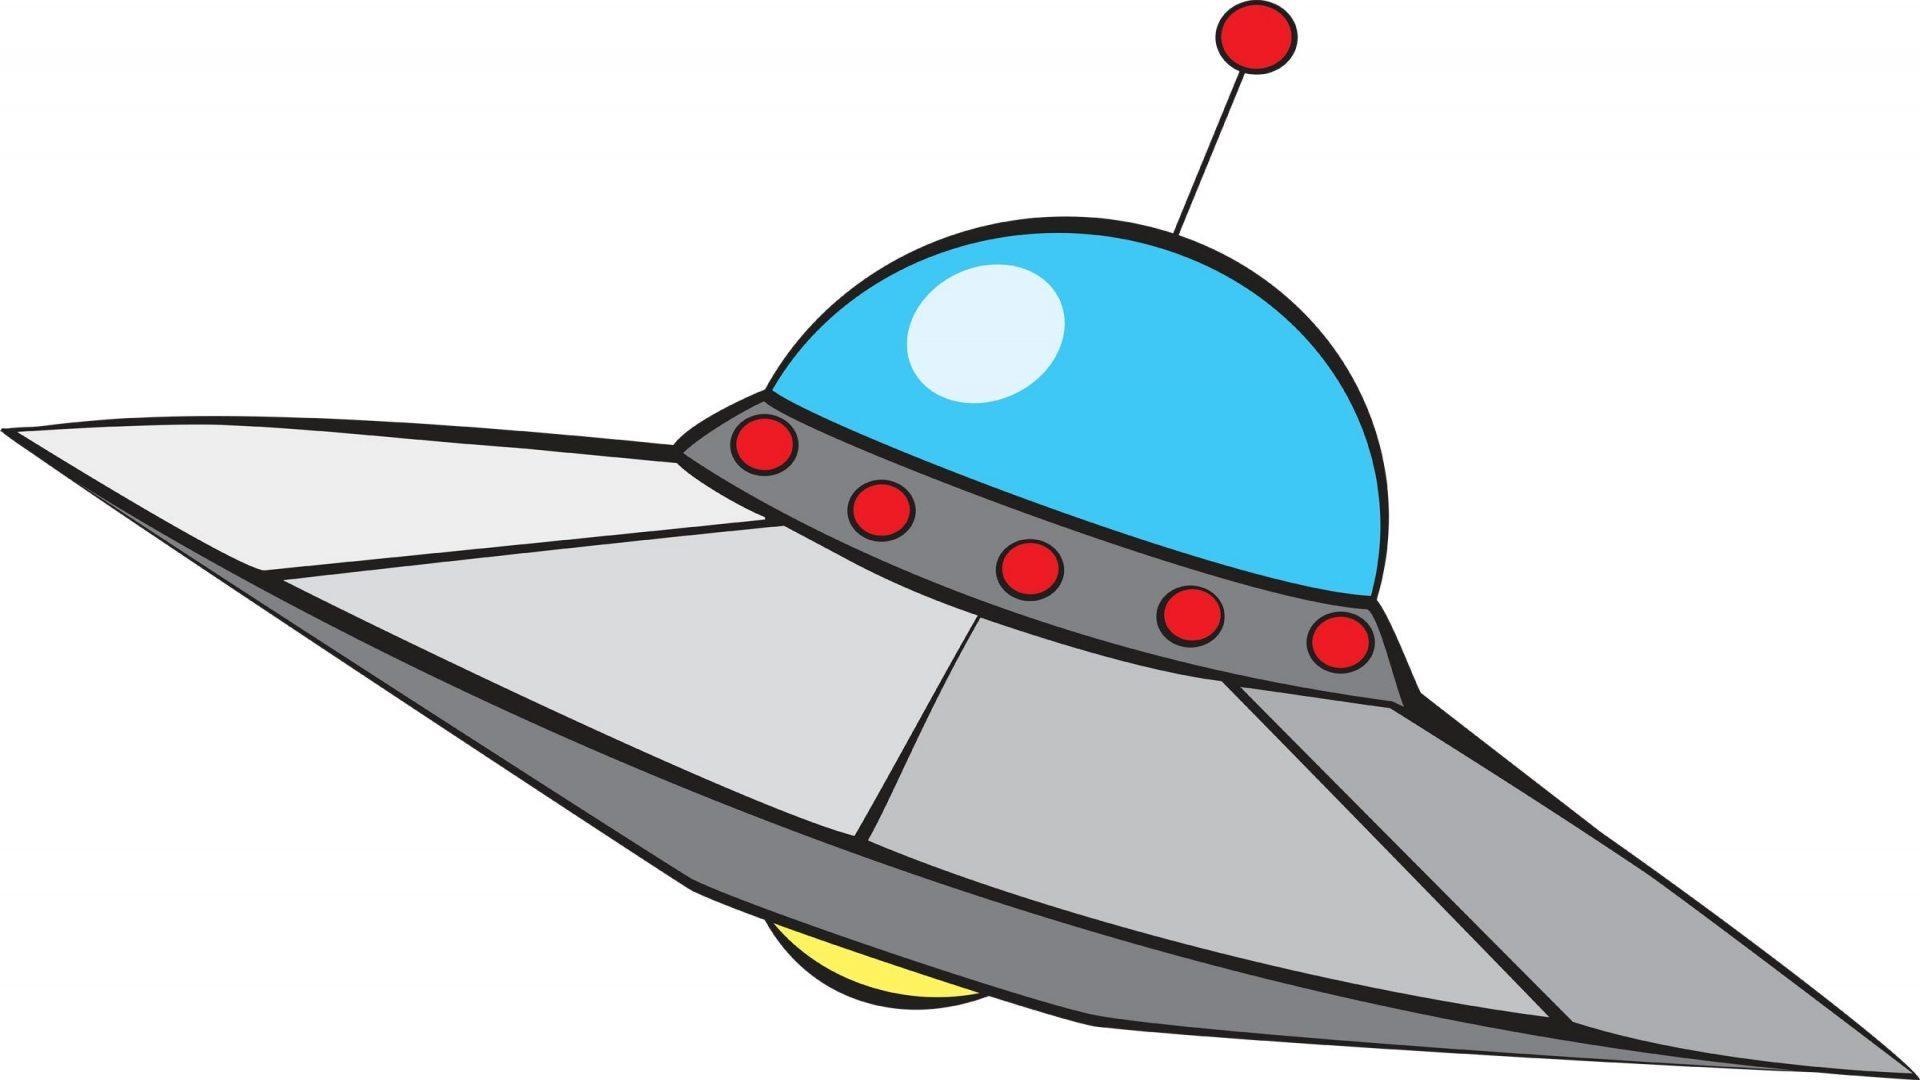 Alien at getdrawings com. Spaceship clipart